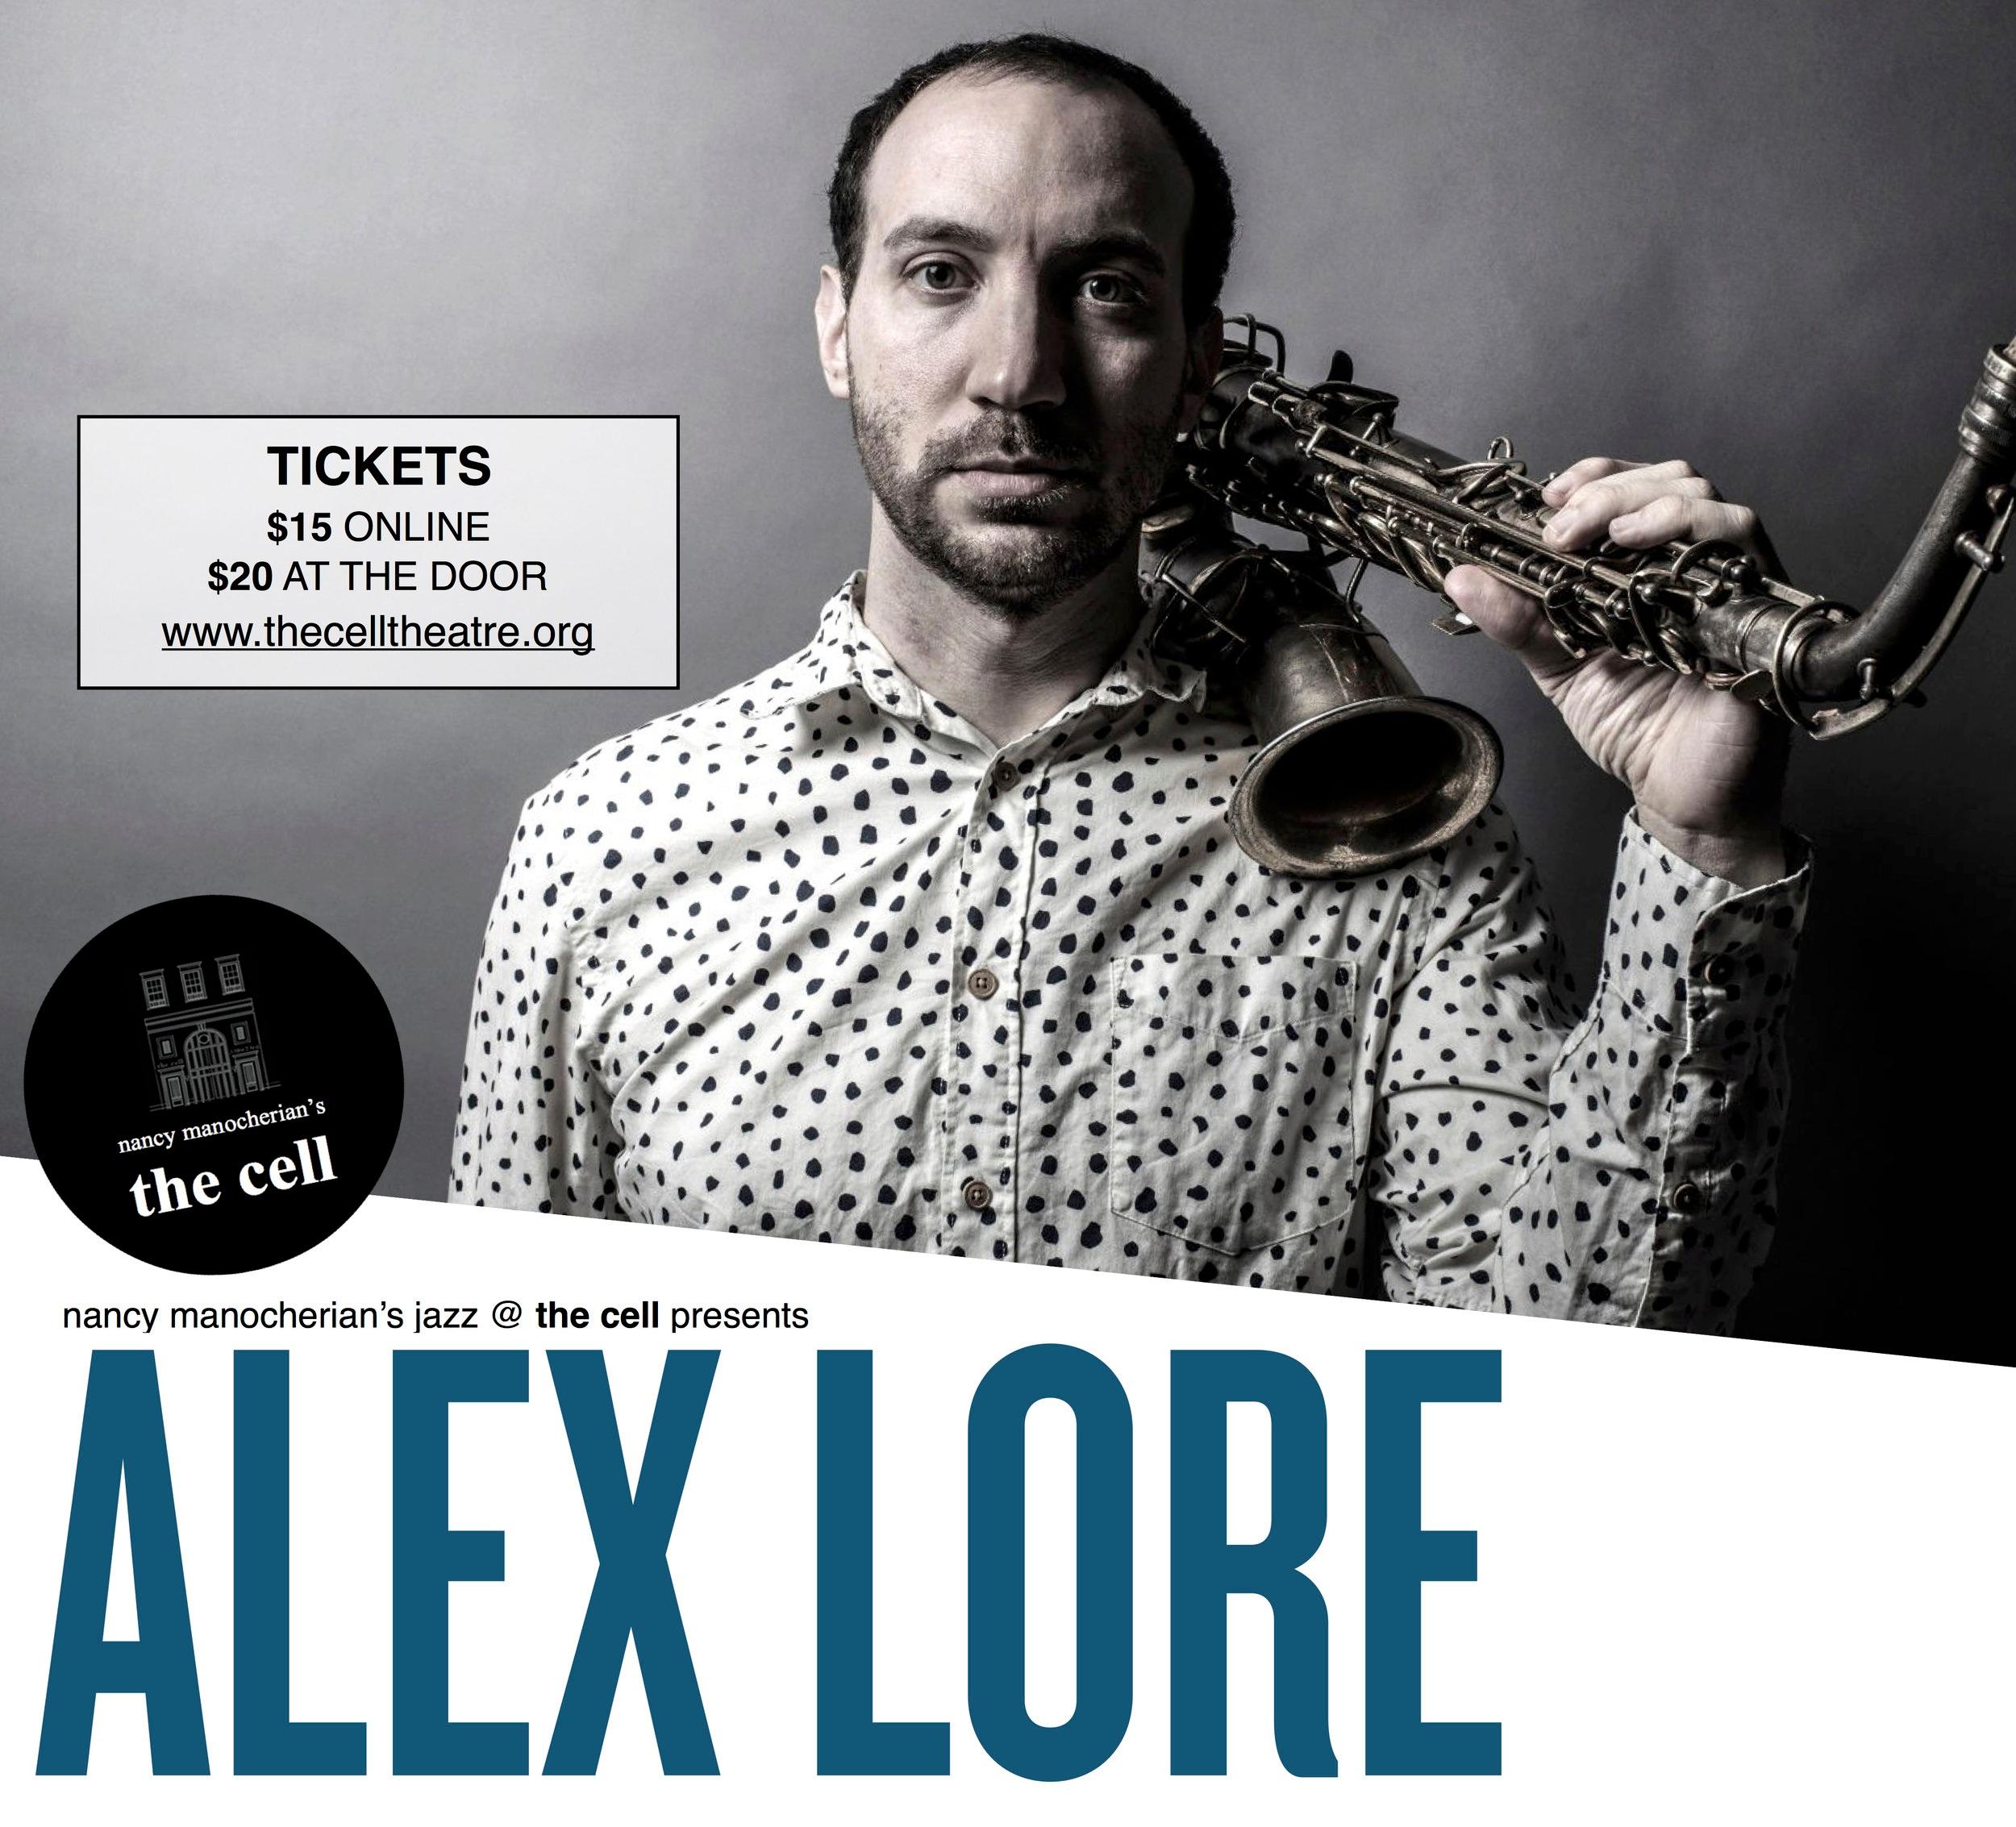 alex+lore+poster.jpg